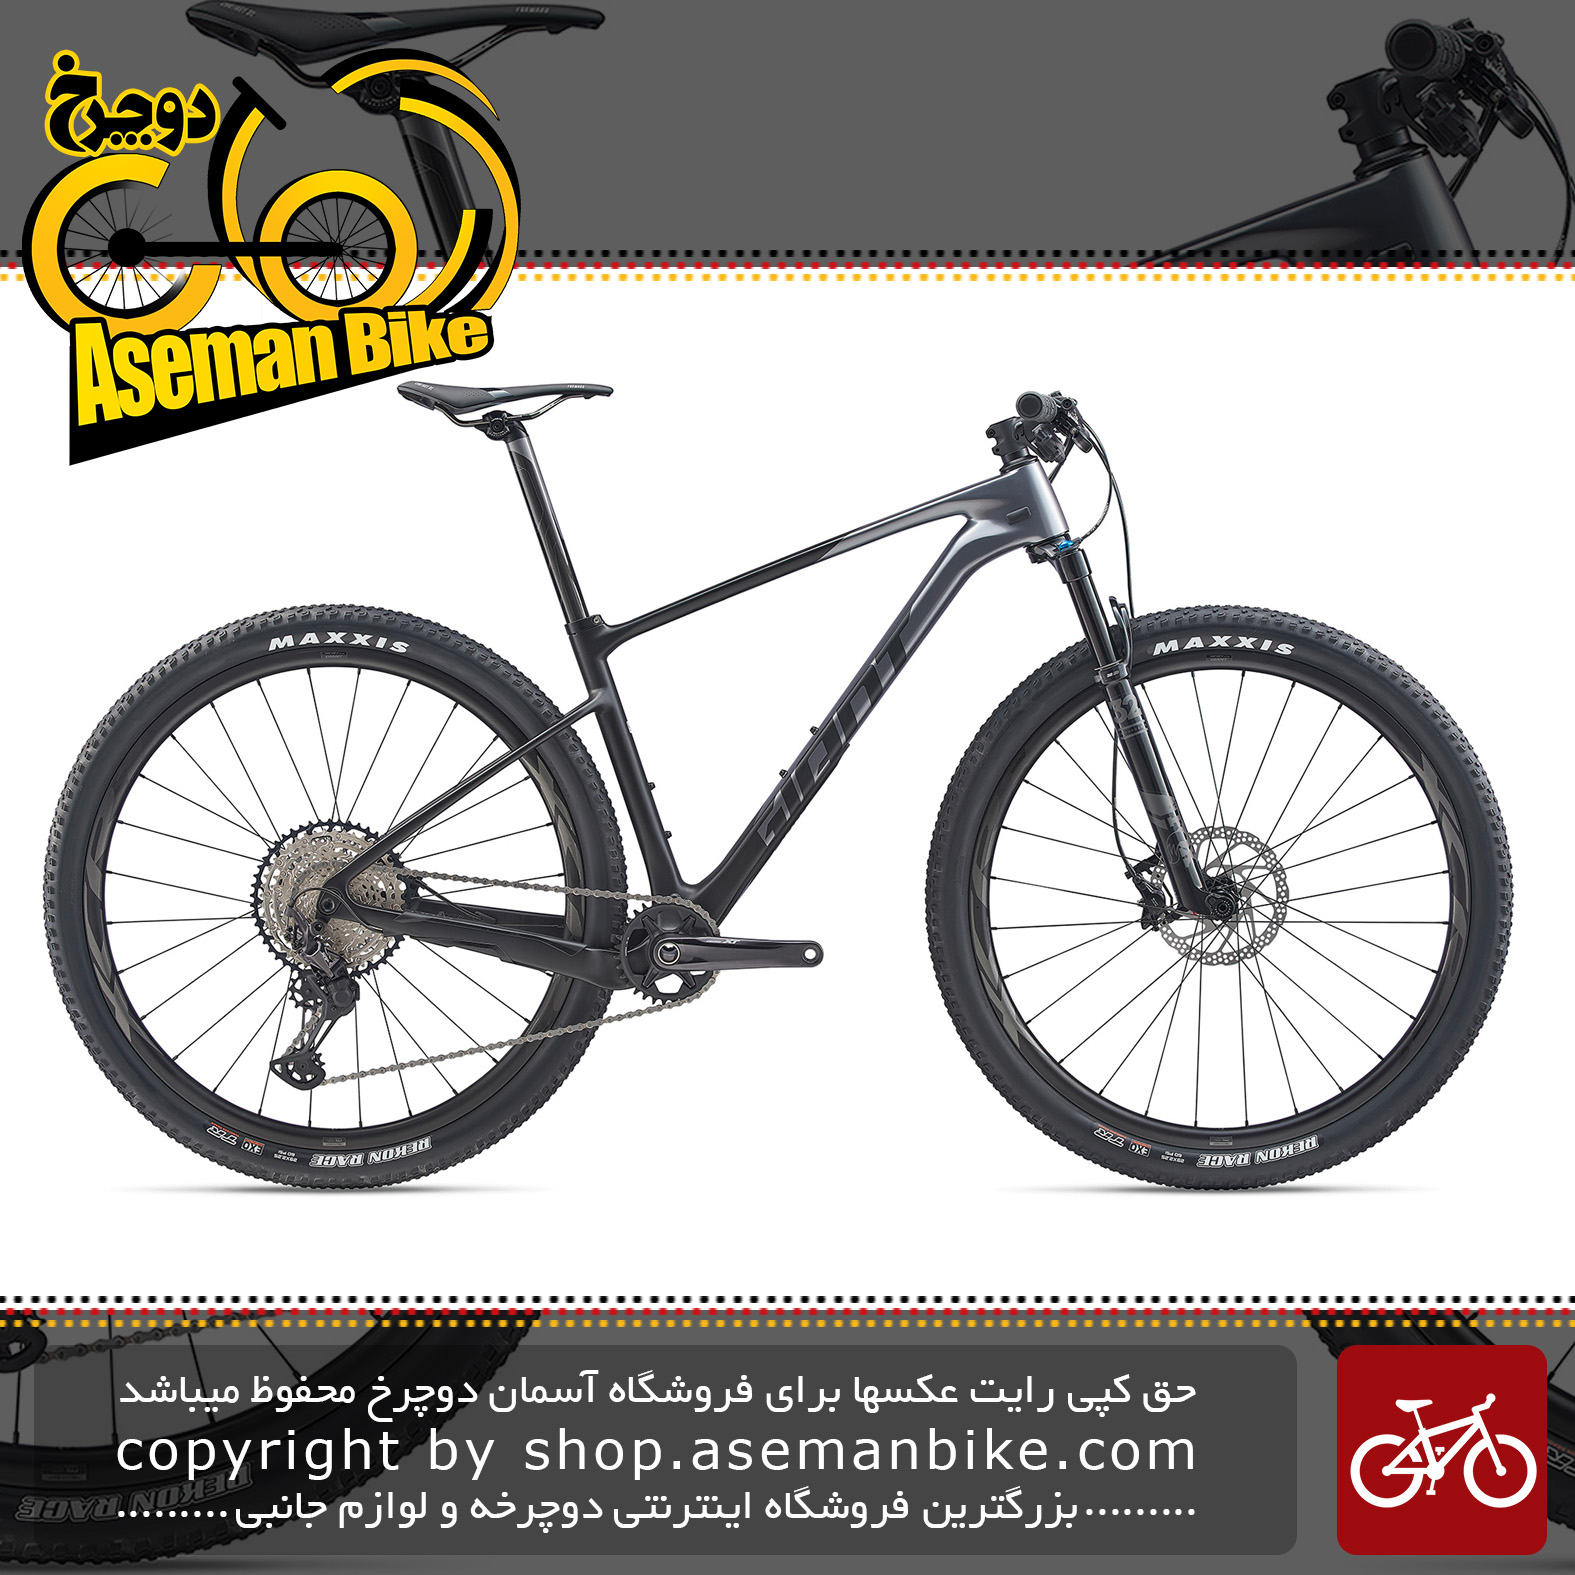 دوچرخه کوهستان جاینت مدل ایکس تی سی ادونس 29 اینچ 1 2020 Giant Mountain Bicycle XTC Advanced 29 1 2020